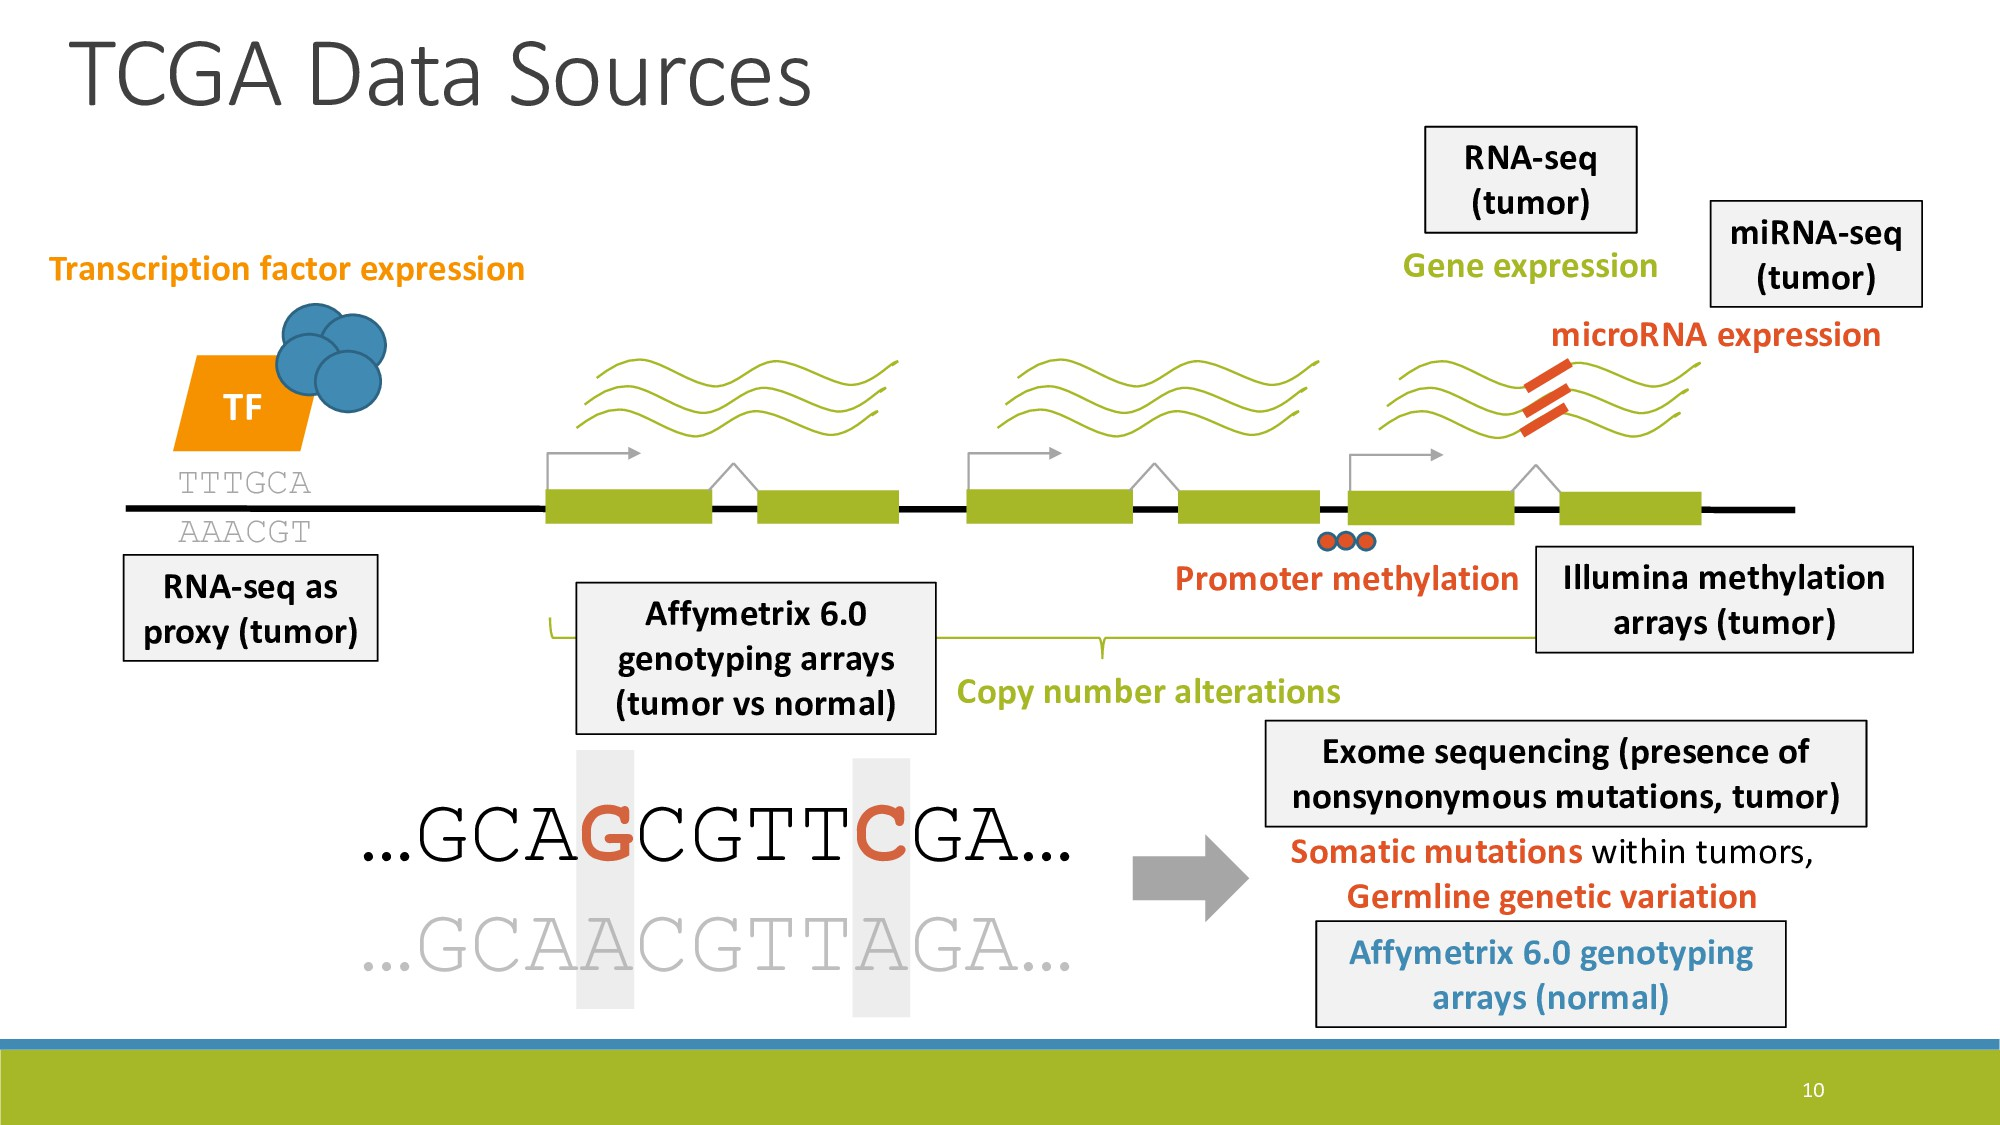 10 Gene expression TTTGCA AAACGT TF Transcripti...